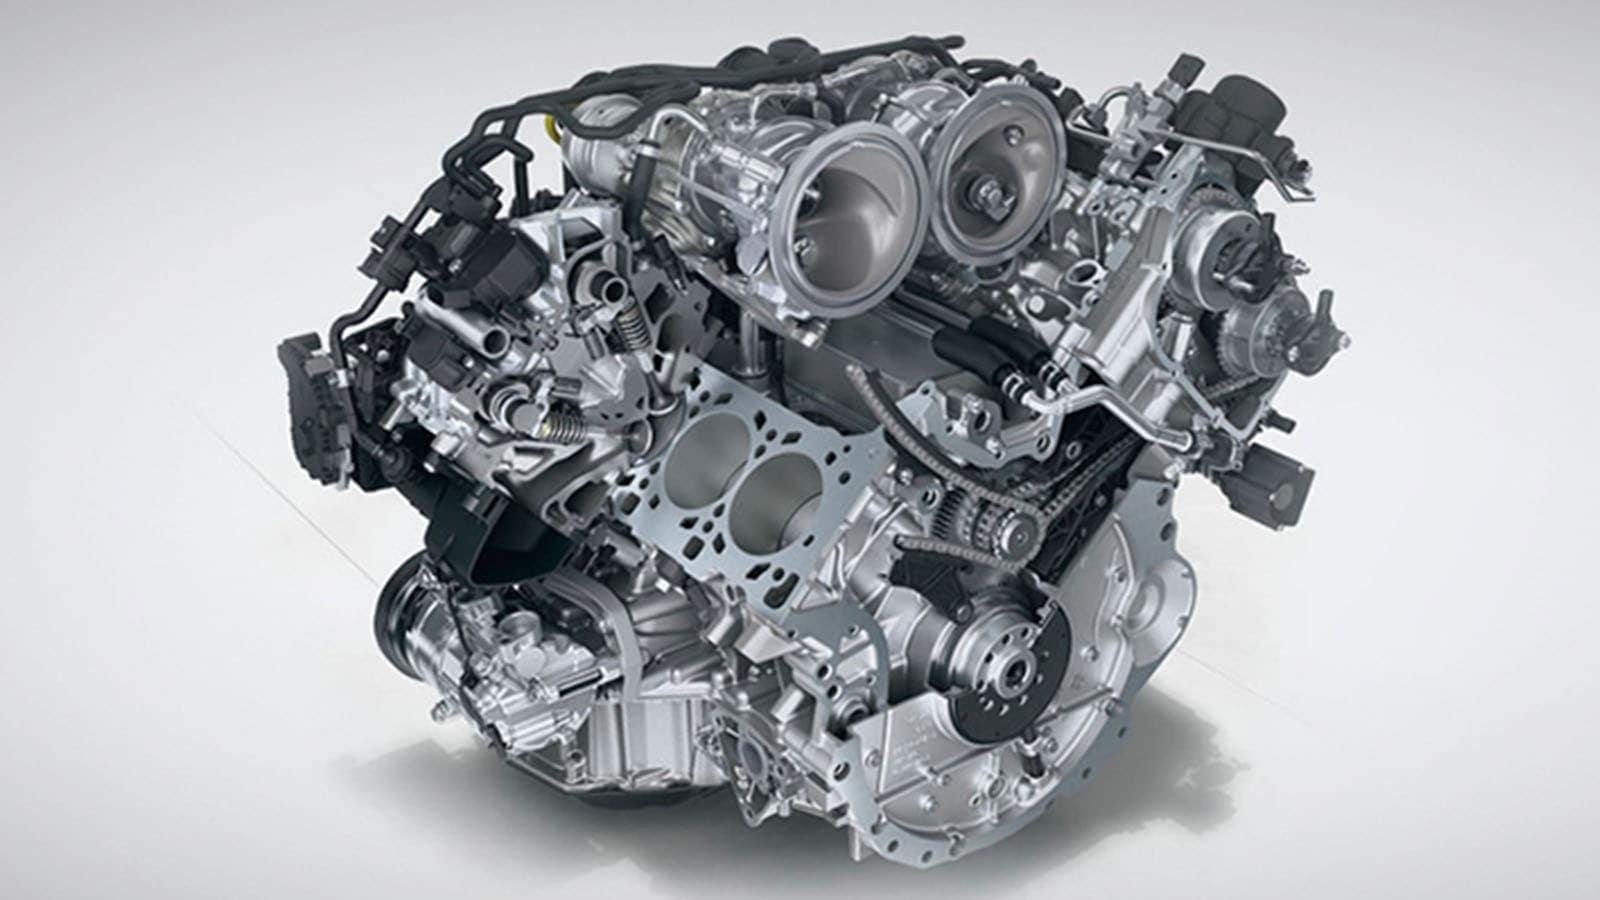 Panamera Engines